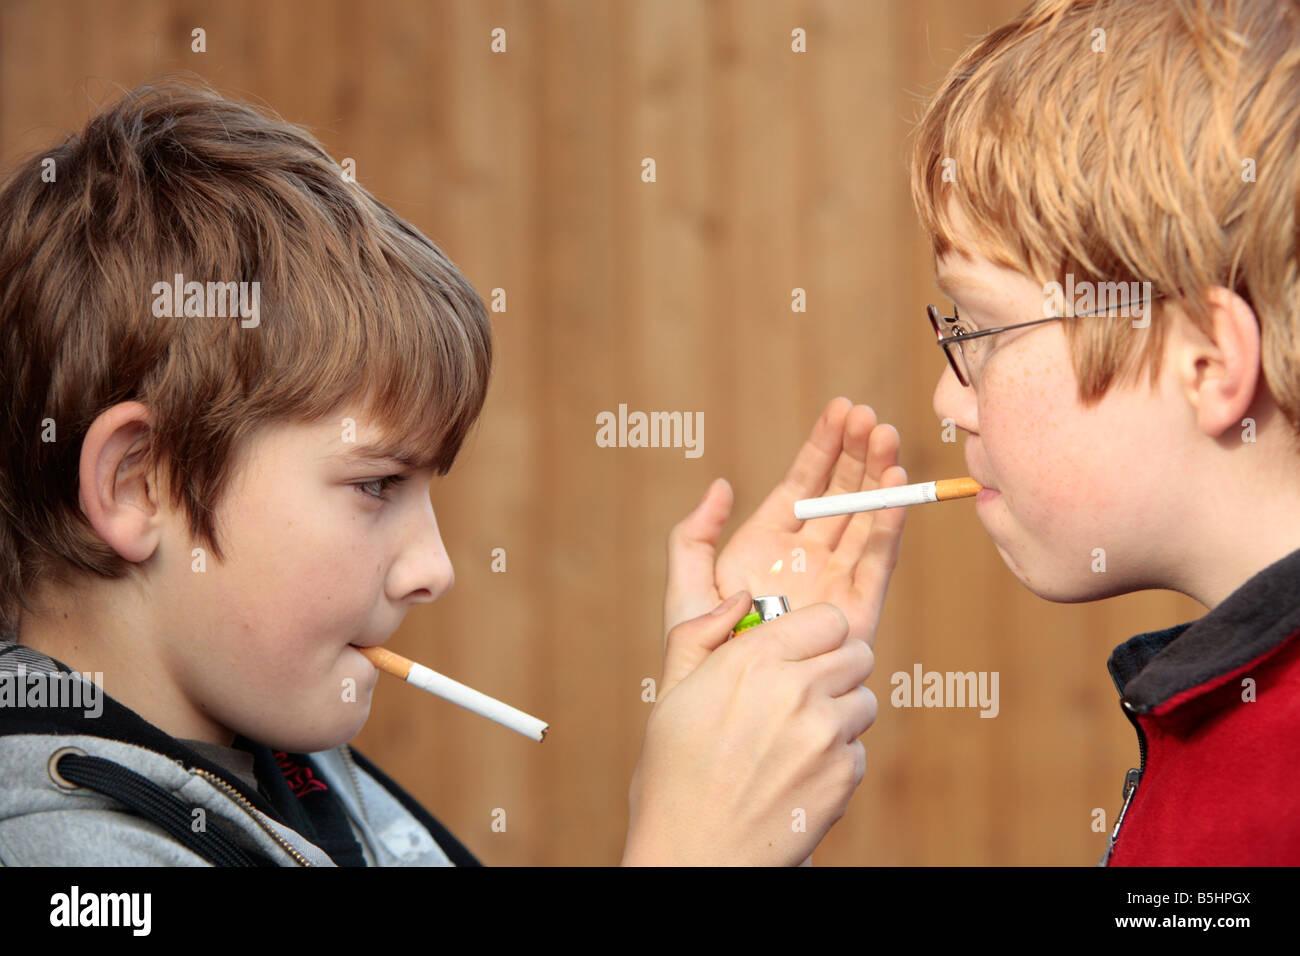 underage smoking Stock Photo - portrait of two underage boys smoking